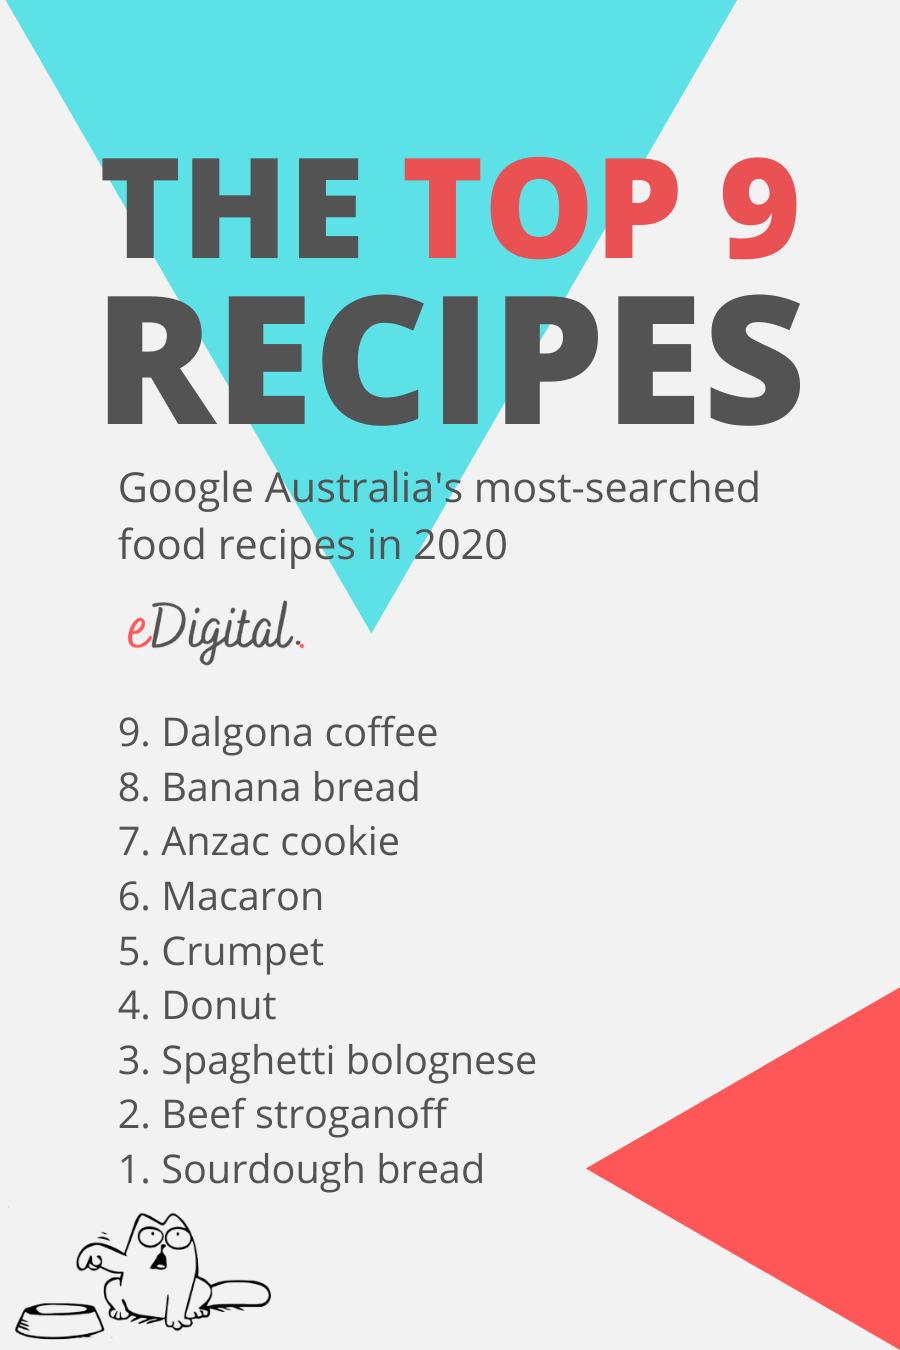 Top most searched food recipes Google Australia 2020 list